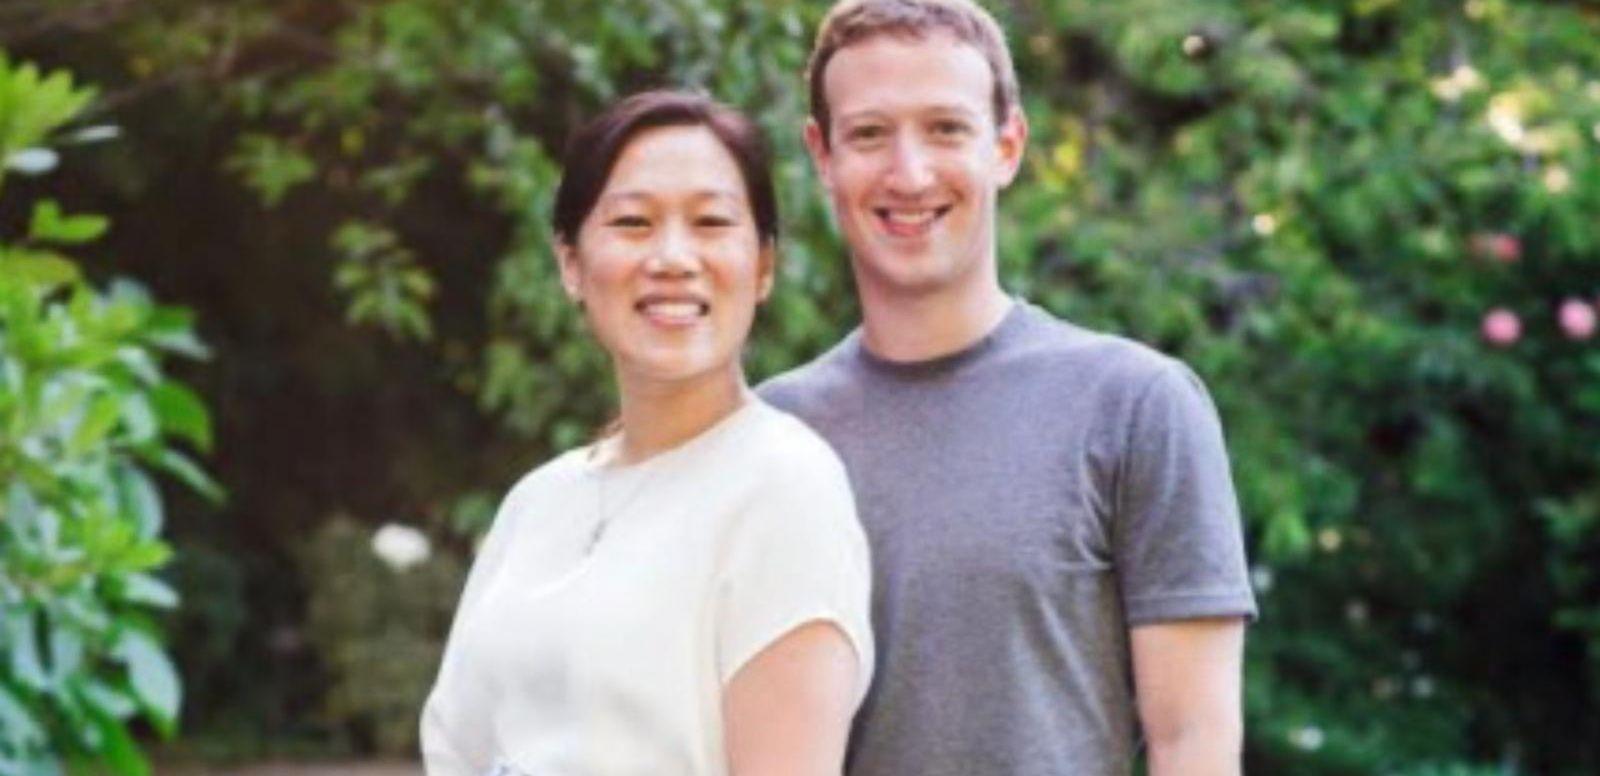 VIDEO: Mark Zuckerberg and Wife Reveal Pregnancy Struggles in Emotional Post